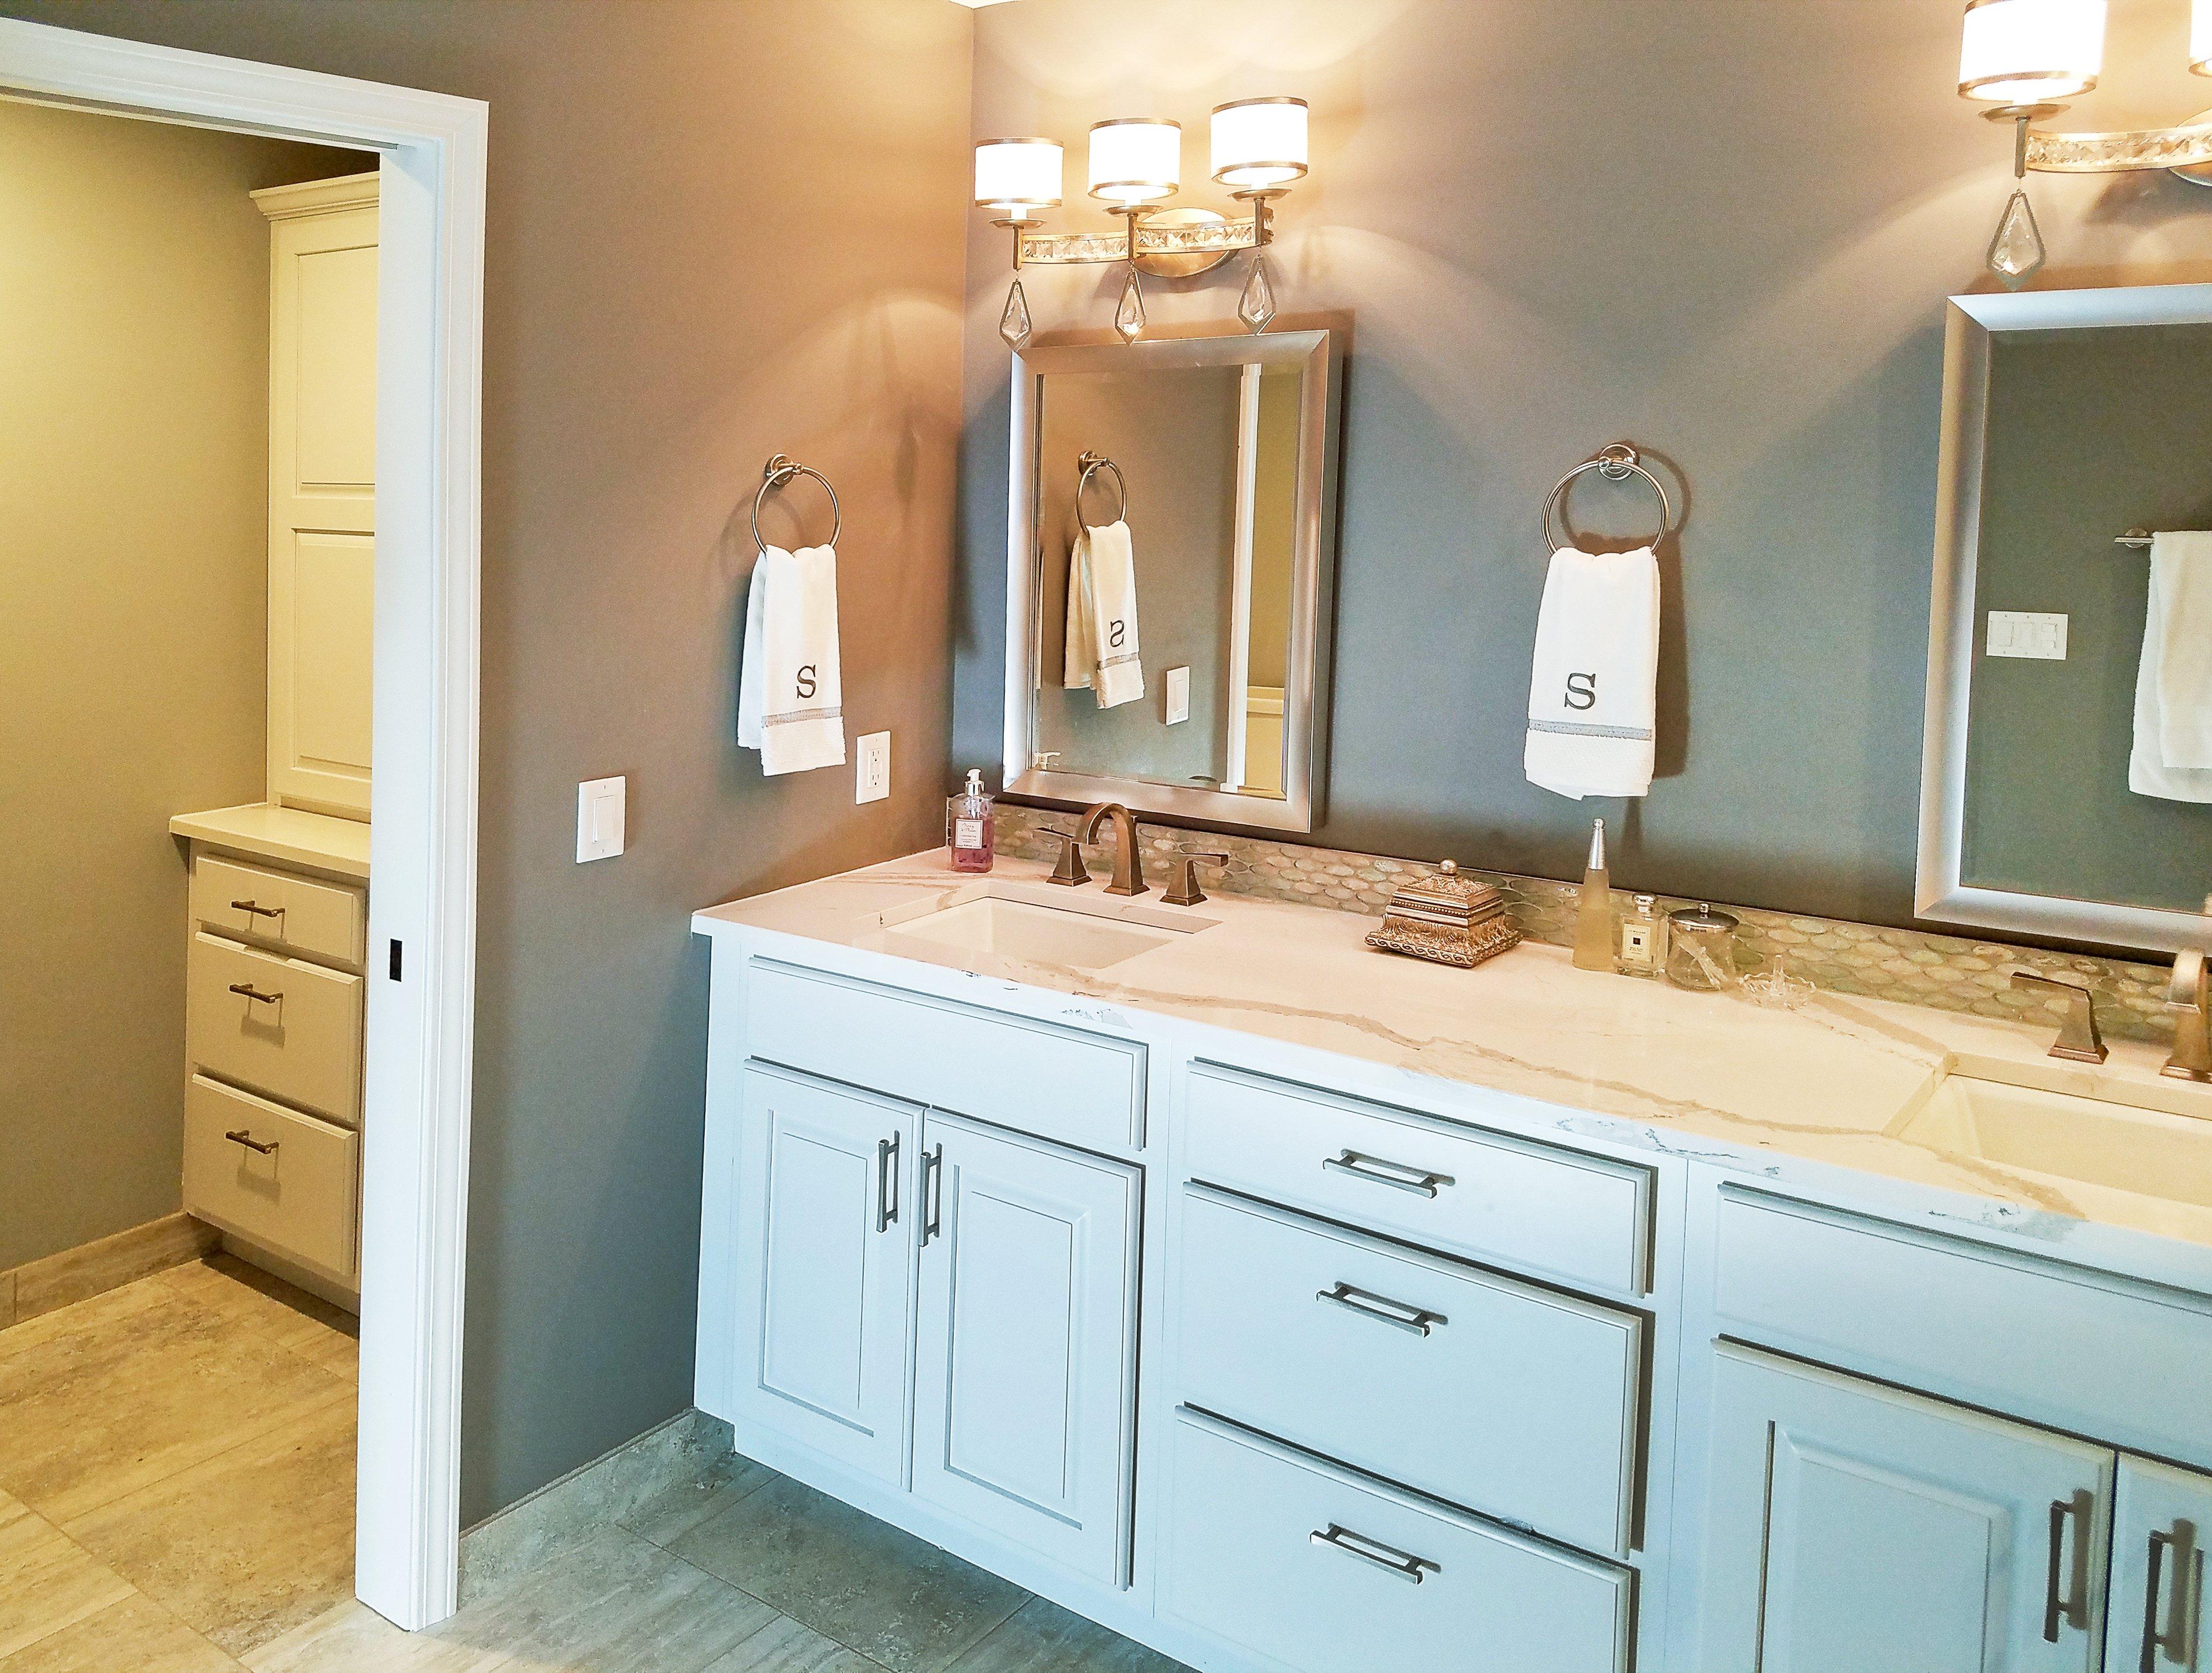 Bathroom Design, bathroom vanity design, towel ring,